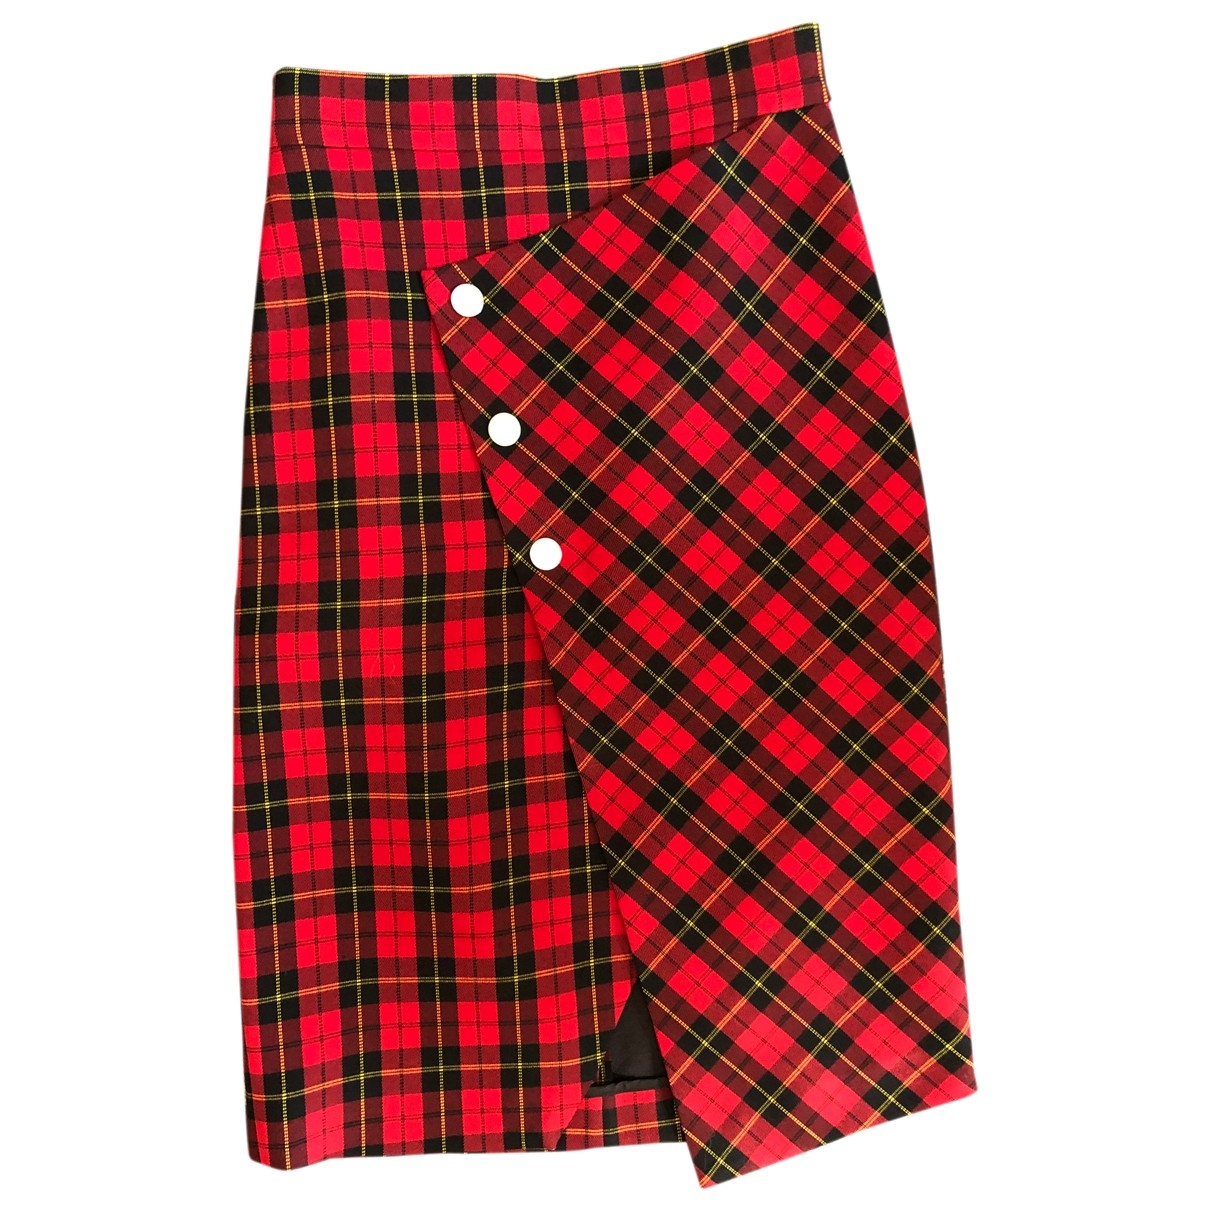 Maje Fall Winter 2019 Red Cotton skirt for Women 36 FR